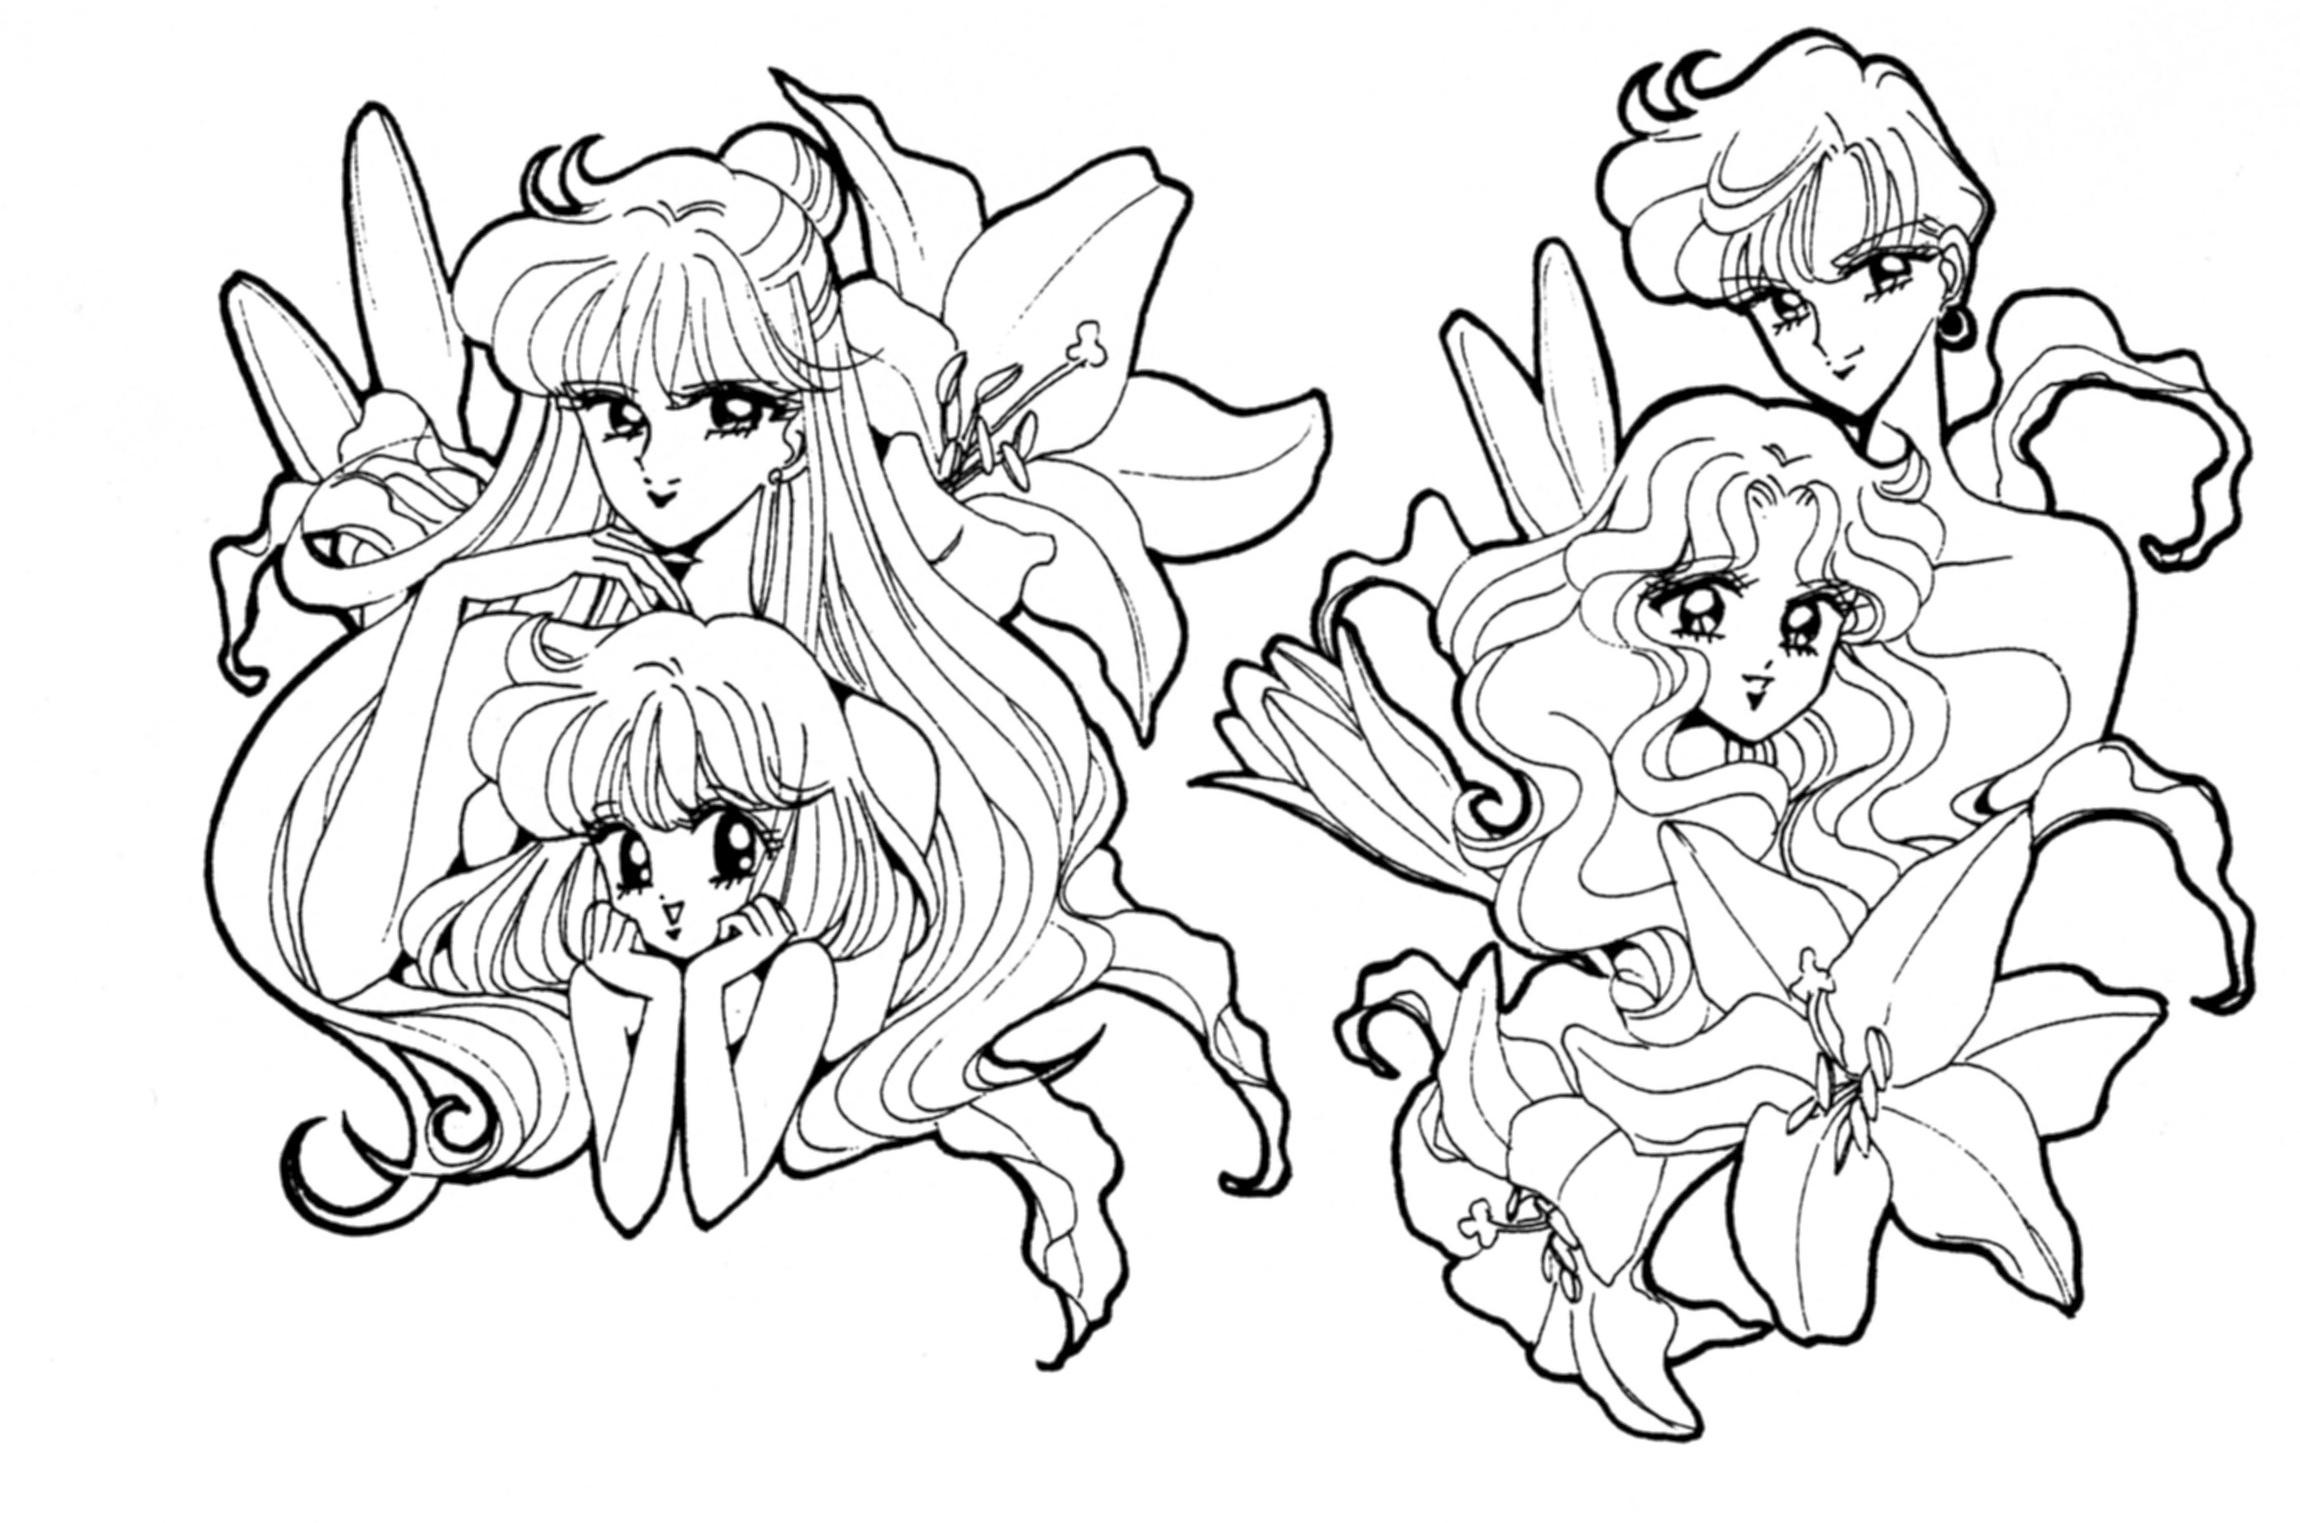 Sa sailor moon coloring games online - Gallery